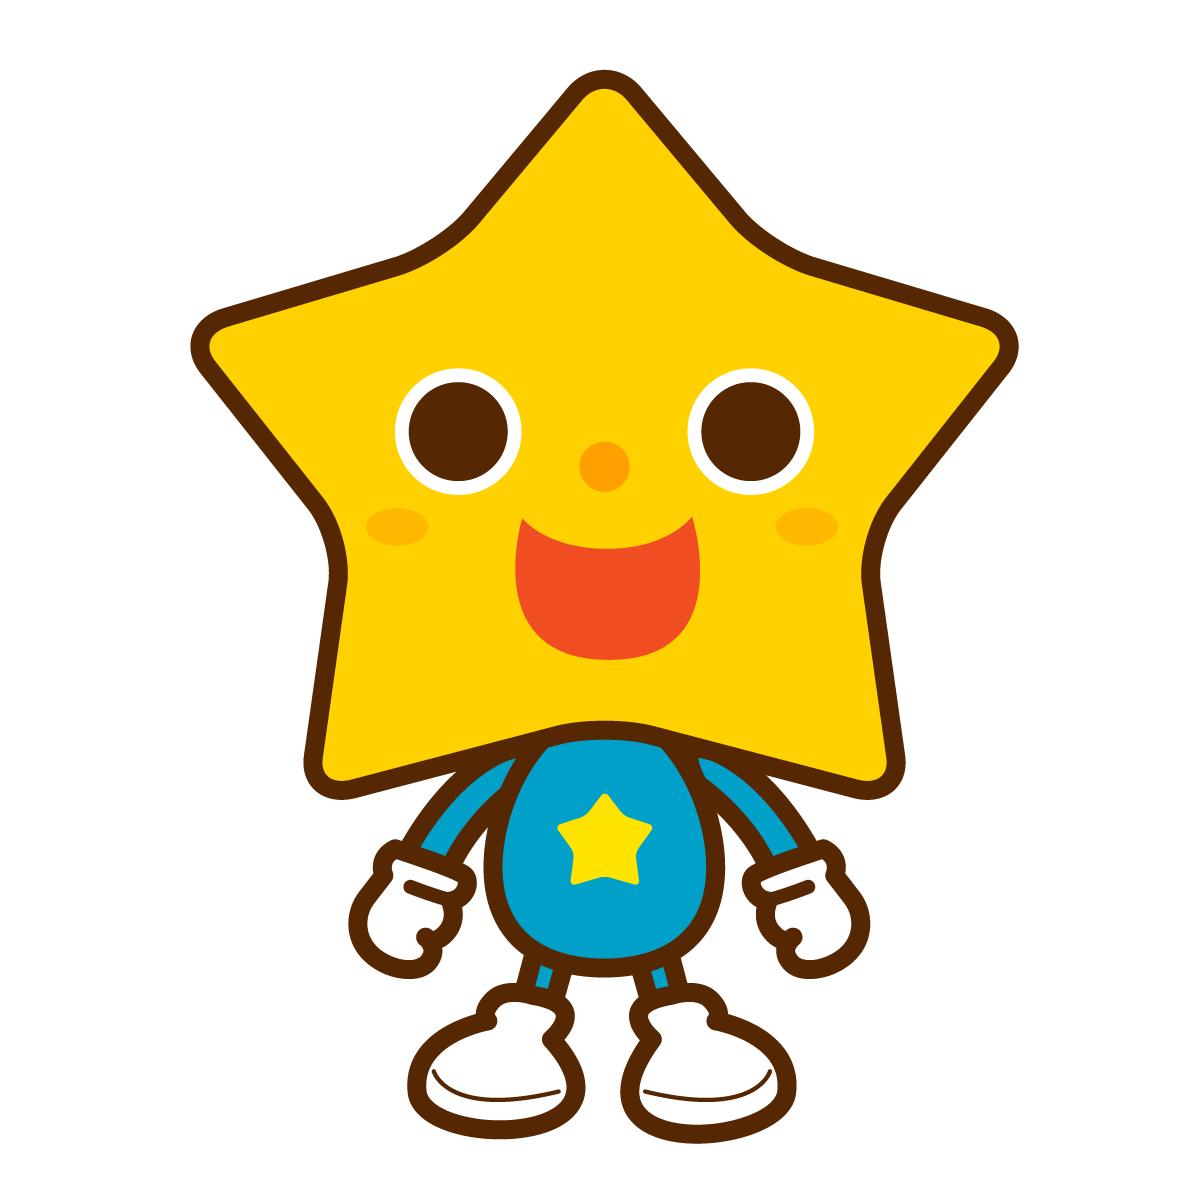 c_starman